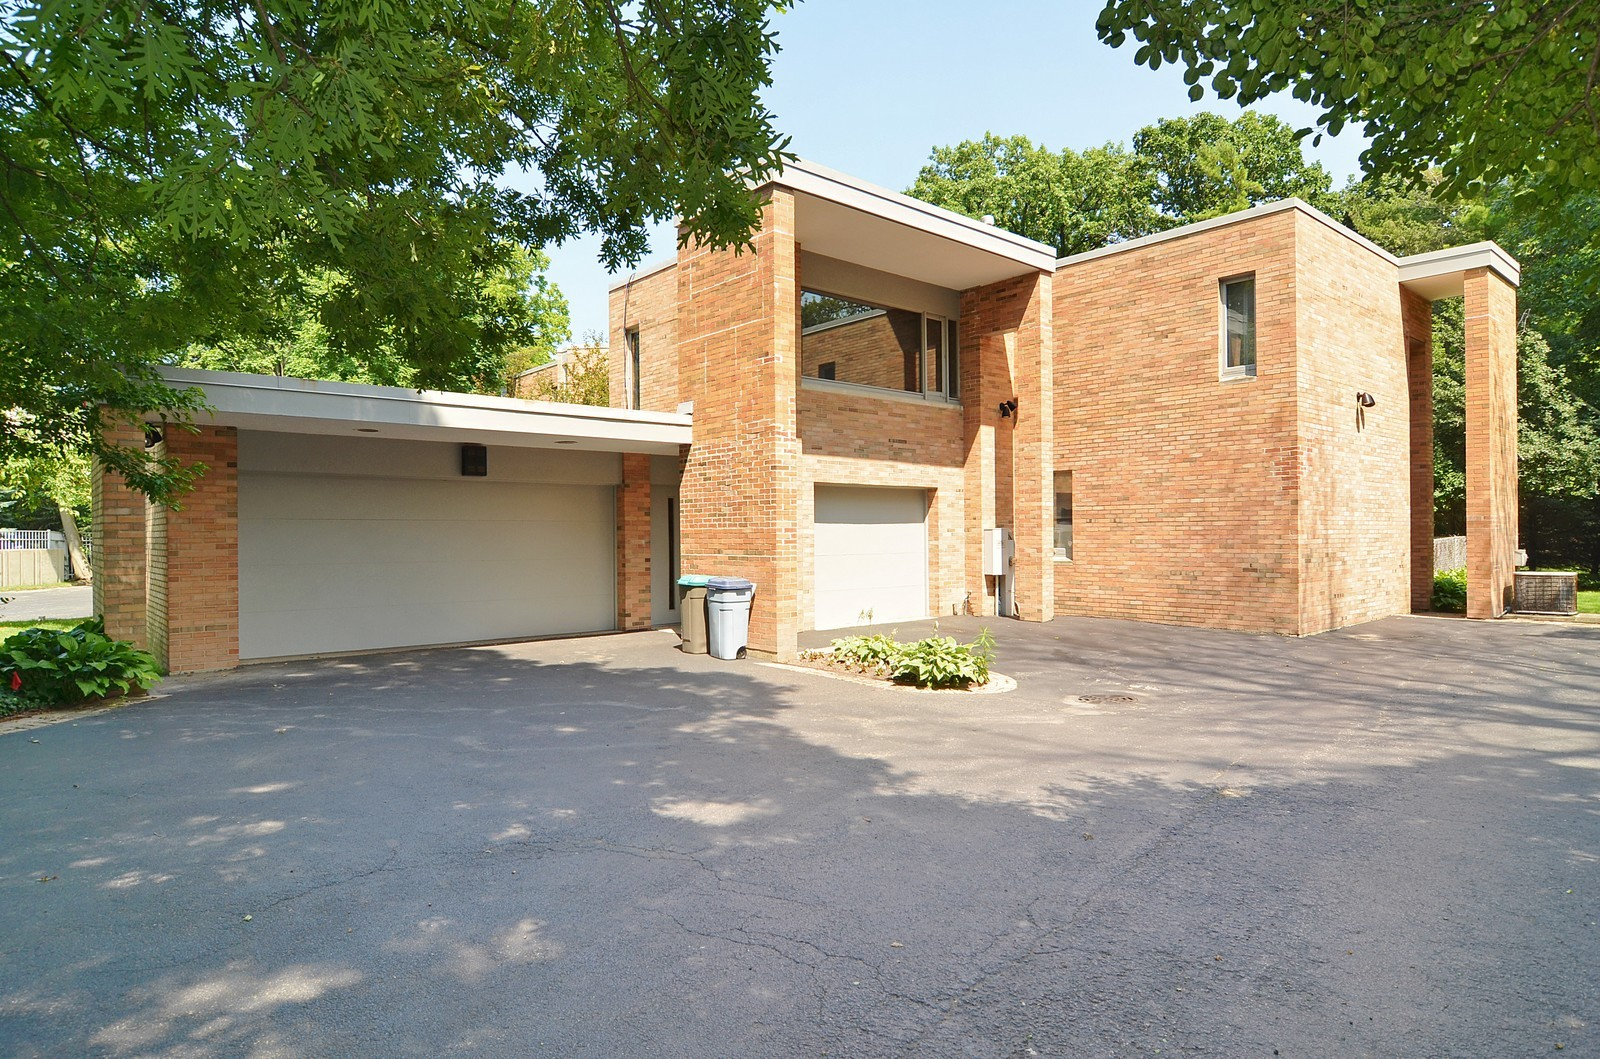 Real Estate Photography - 350 Sunrise Circle, Glencoe, IL, 60022 - 3 Car Garage